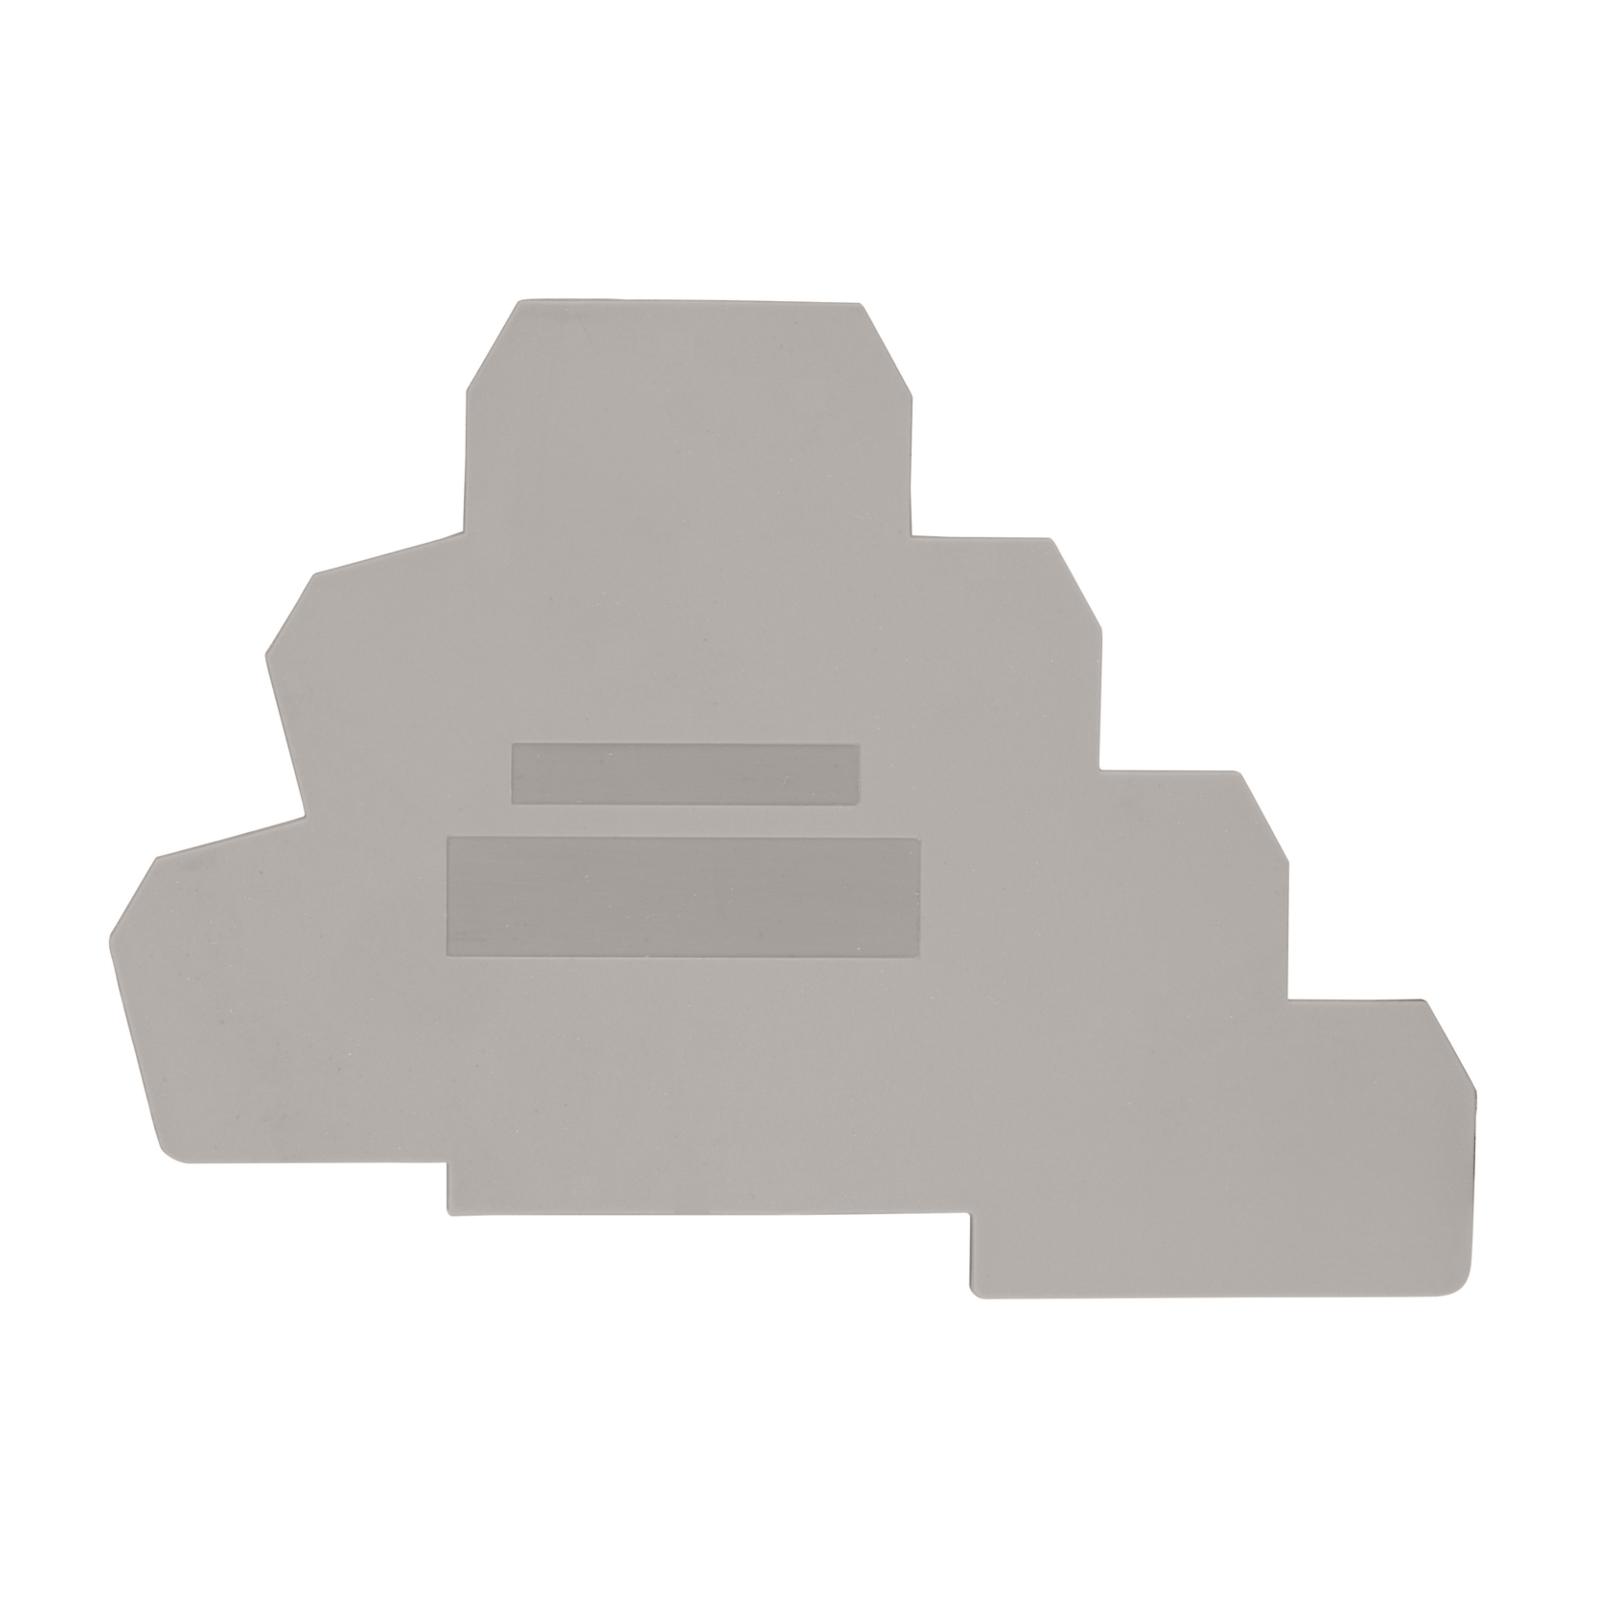 1 Stk Endplatte für Dreistockklemme Type PUK3T IK680203--